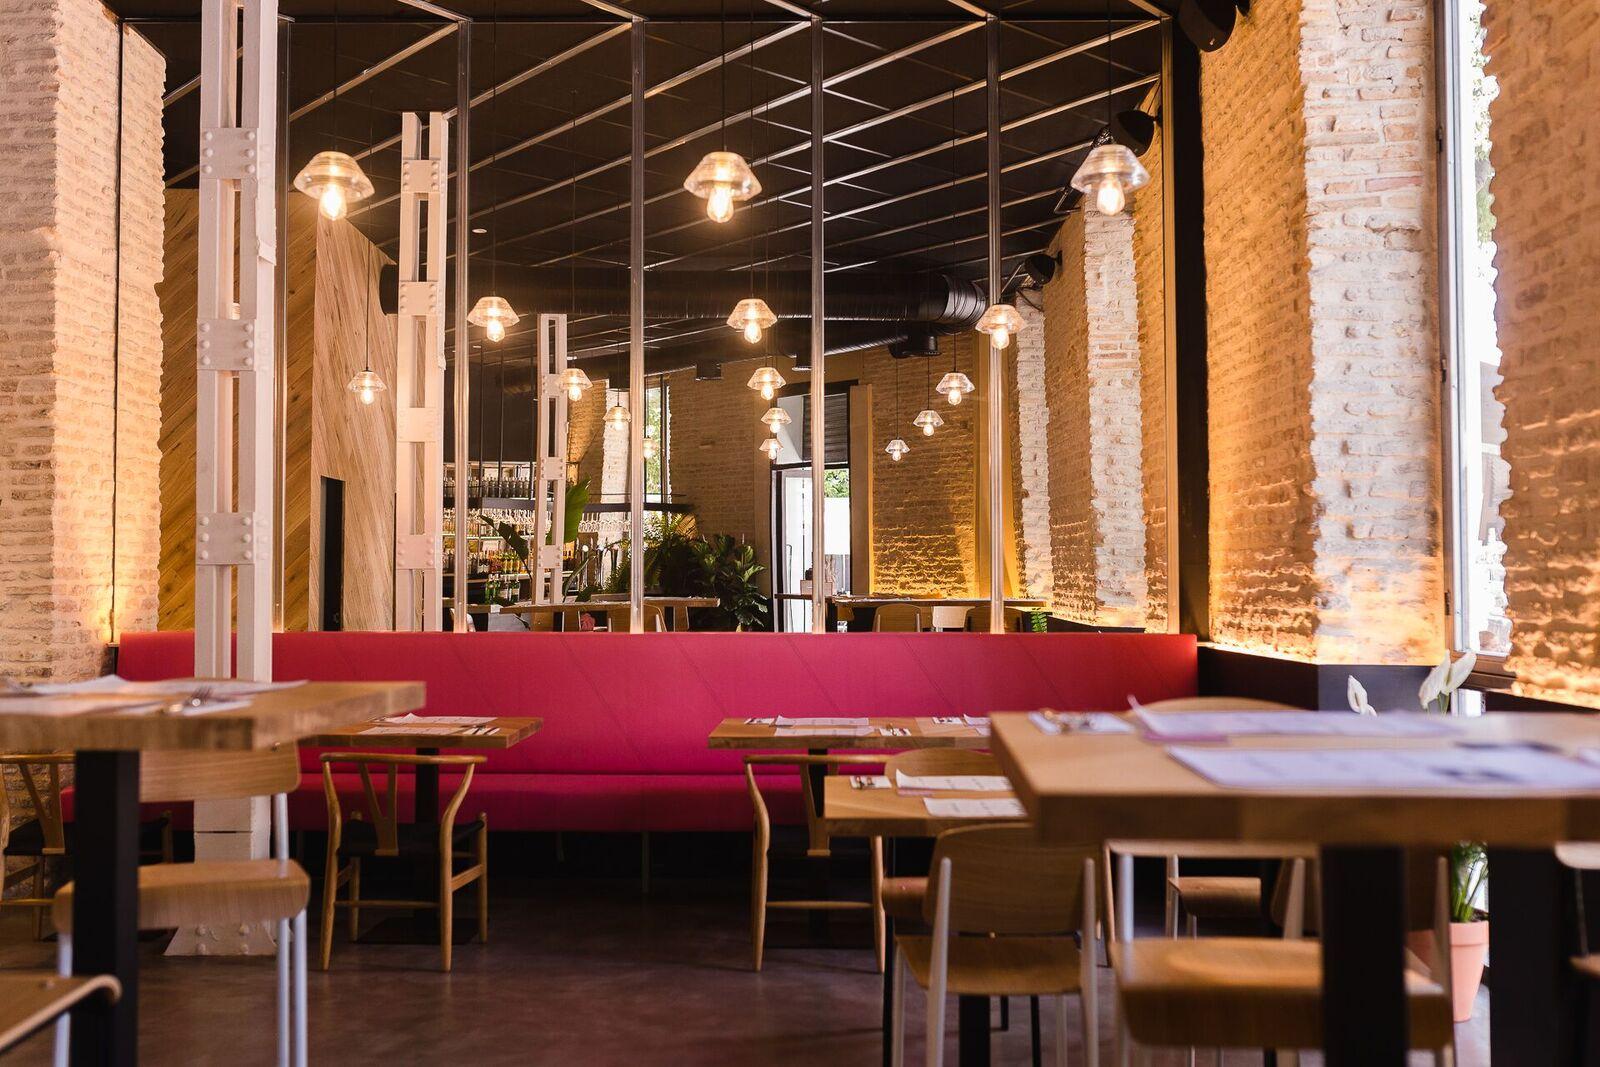 Interior restaurante la antojeria